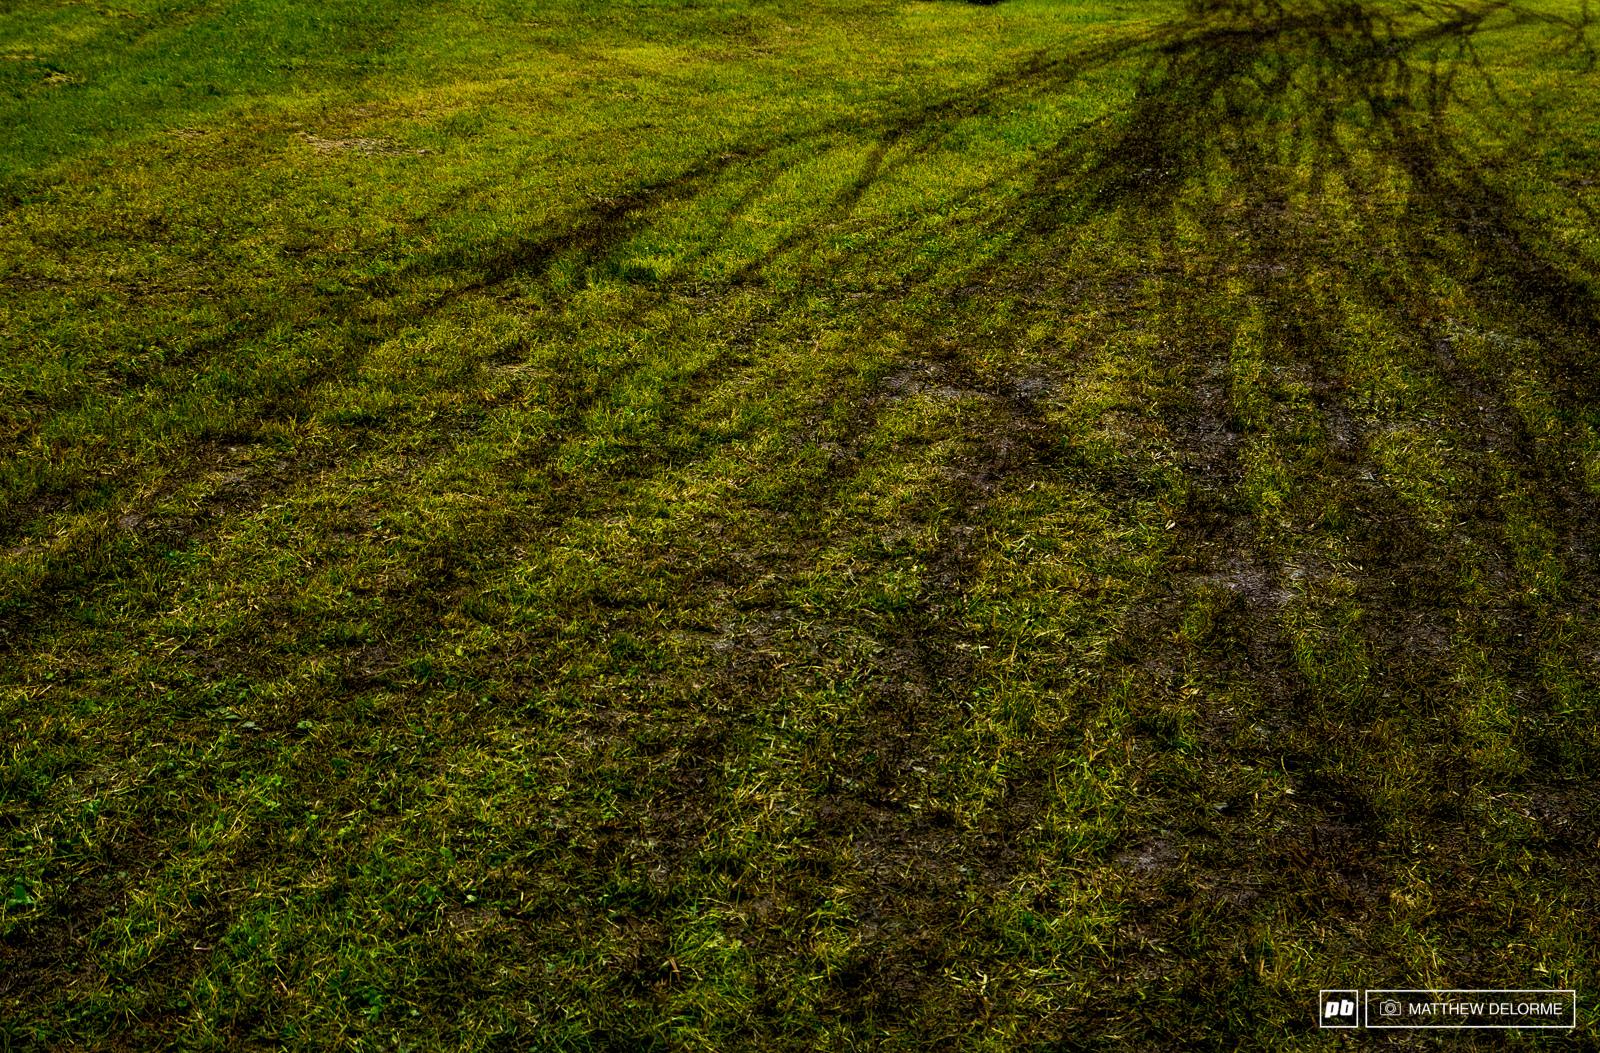 First tracks on fresh grass.